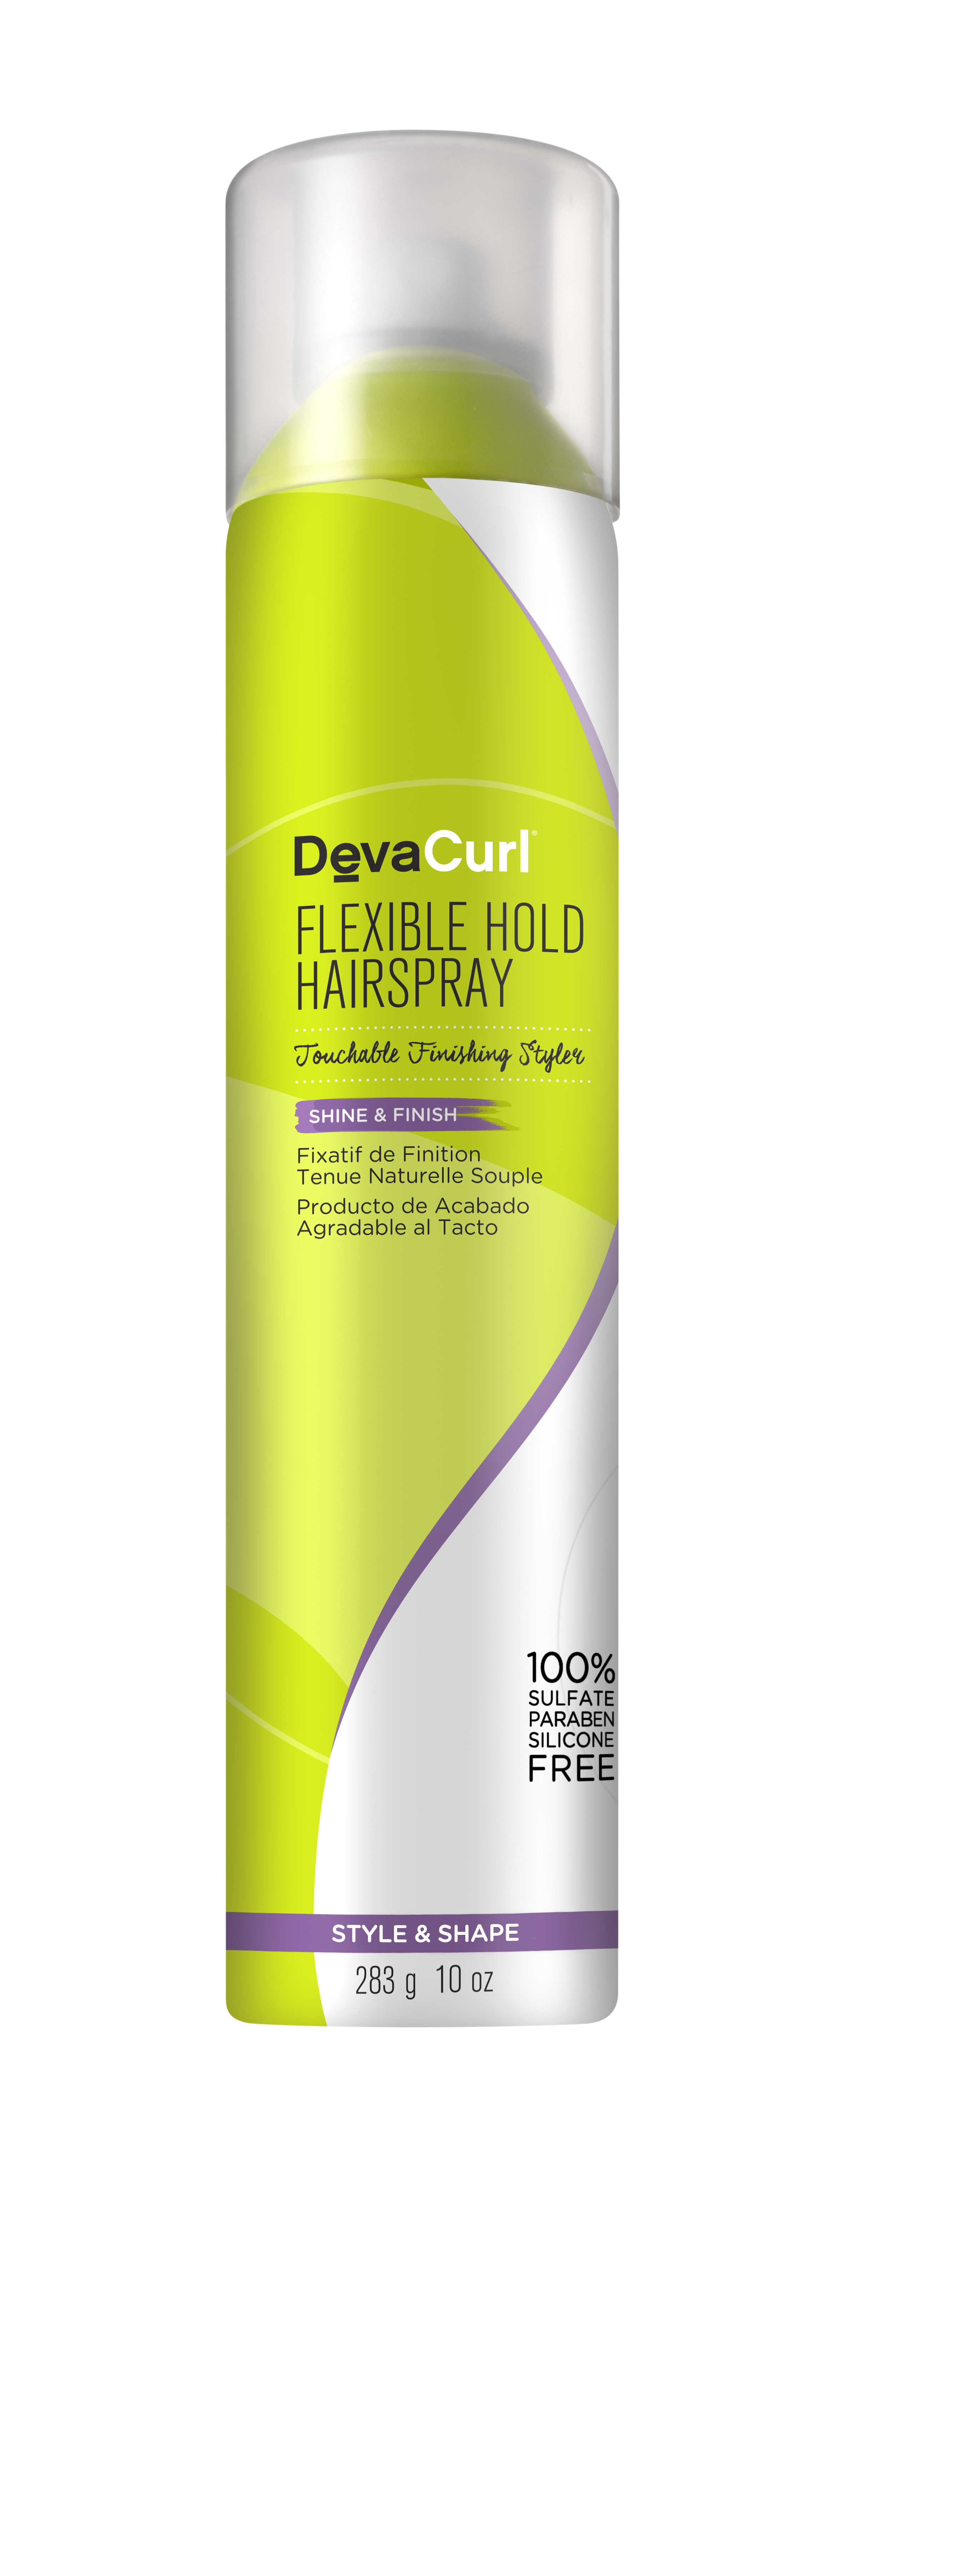 DevaCurl Flexible Hold Hair Spray, Touchable Finishing Styler